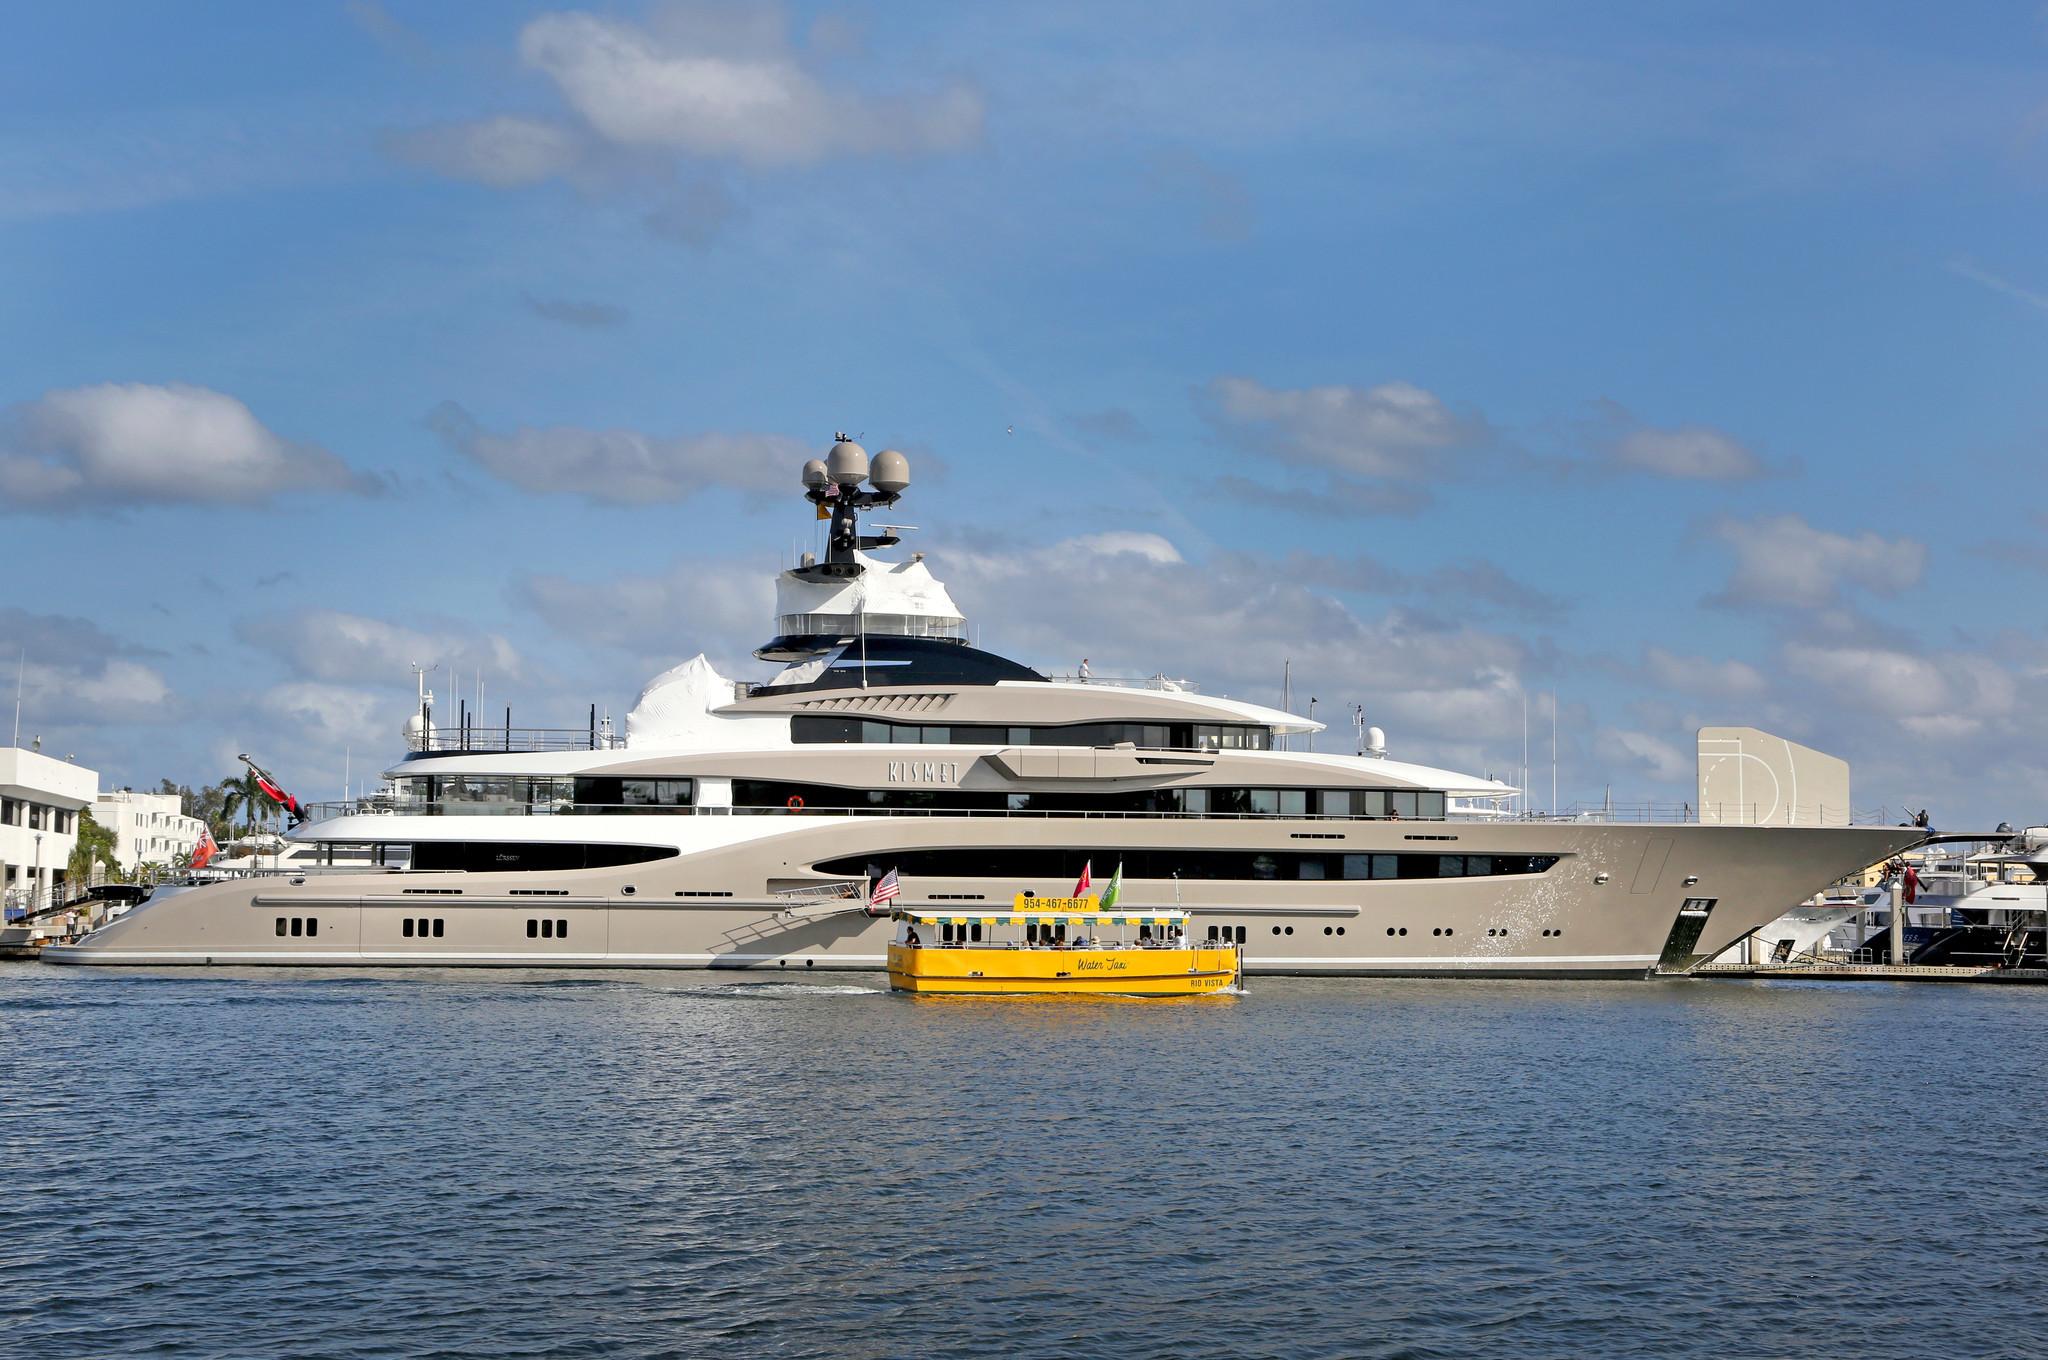 Fort Lauderdales Bahia Mar Marina Hosts Its Biggest Yacht